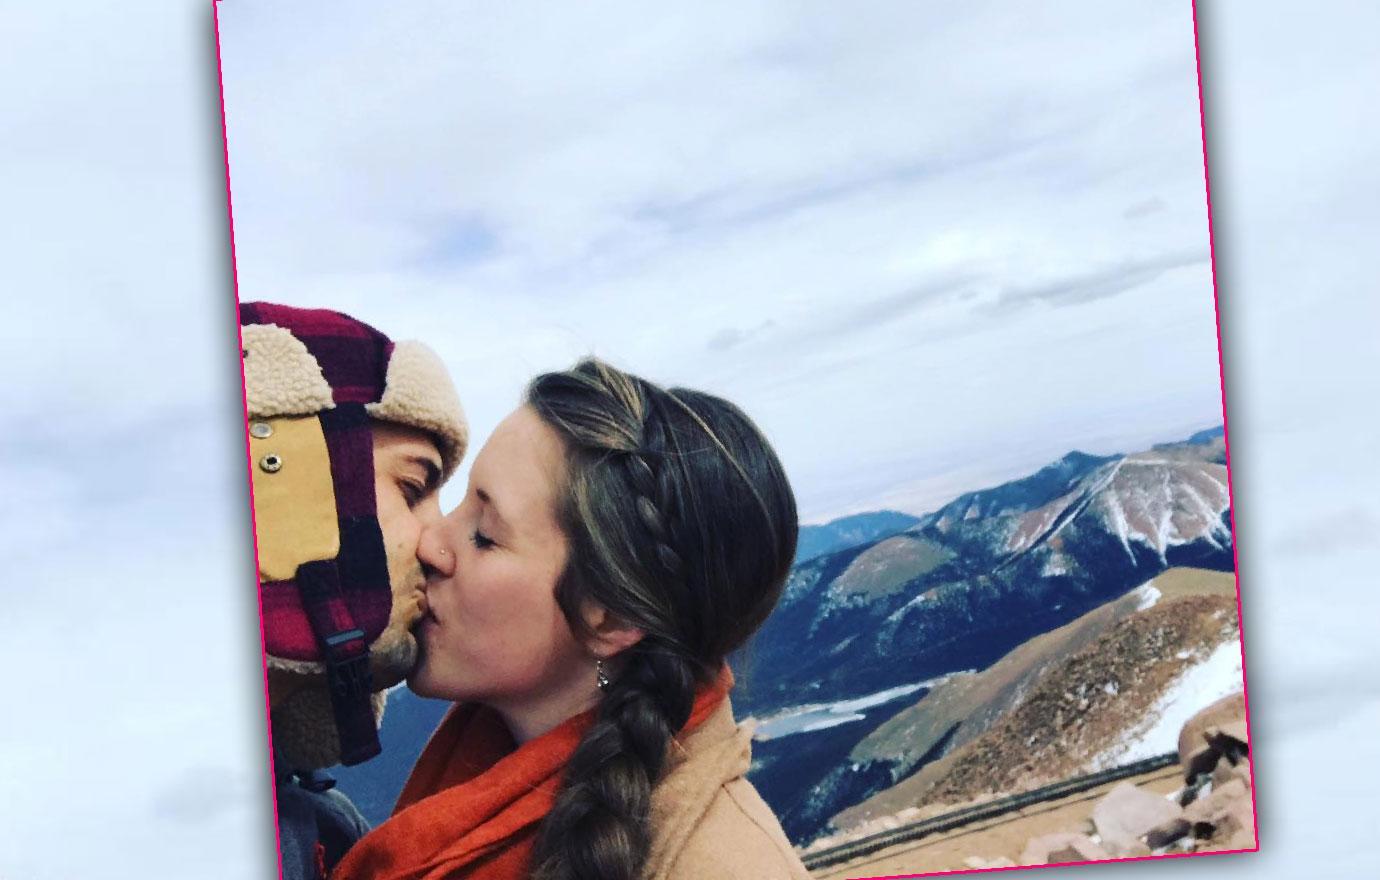 Derick Dillard Jill Duggar Get High On Love Mountain Climb Kiss